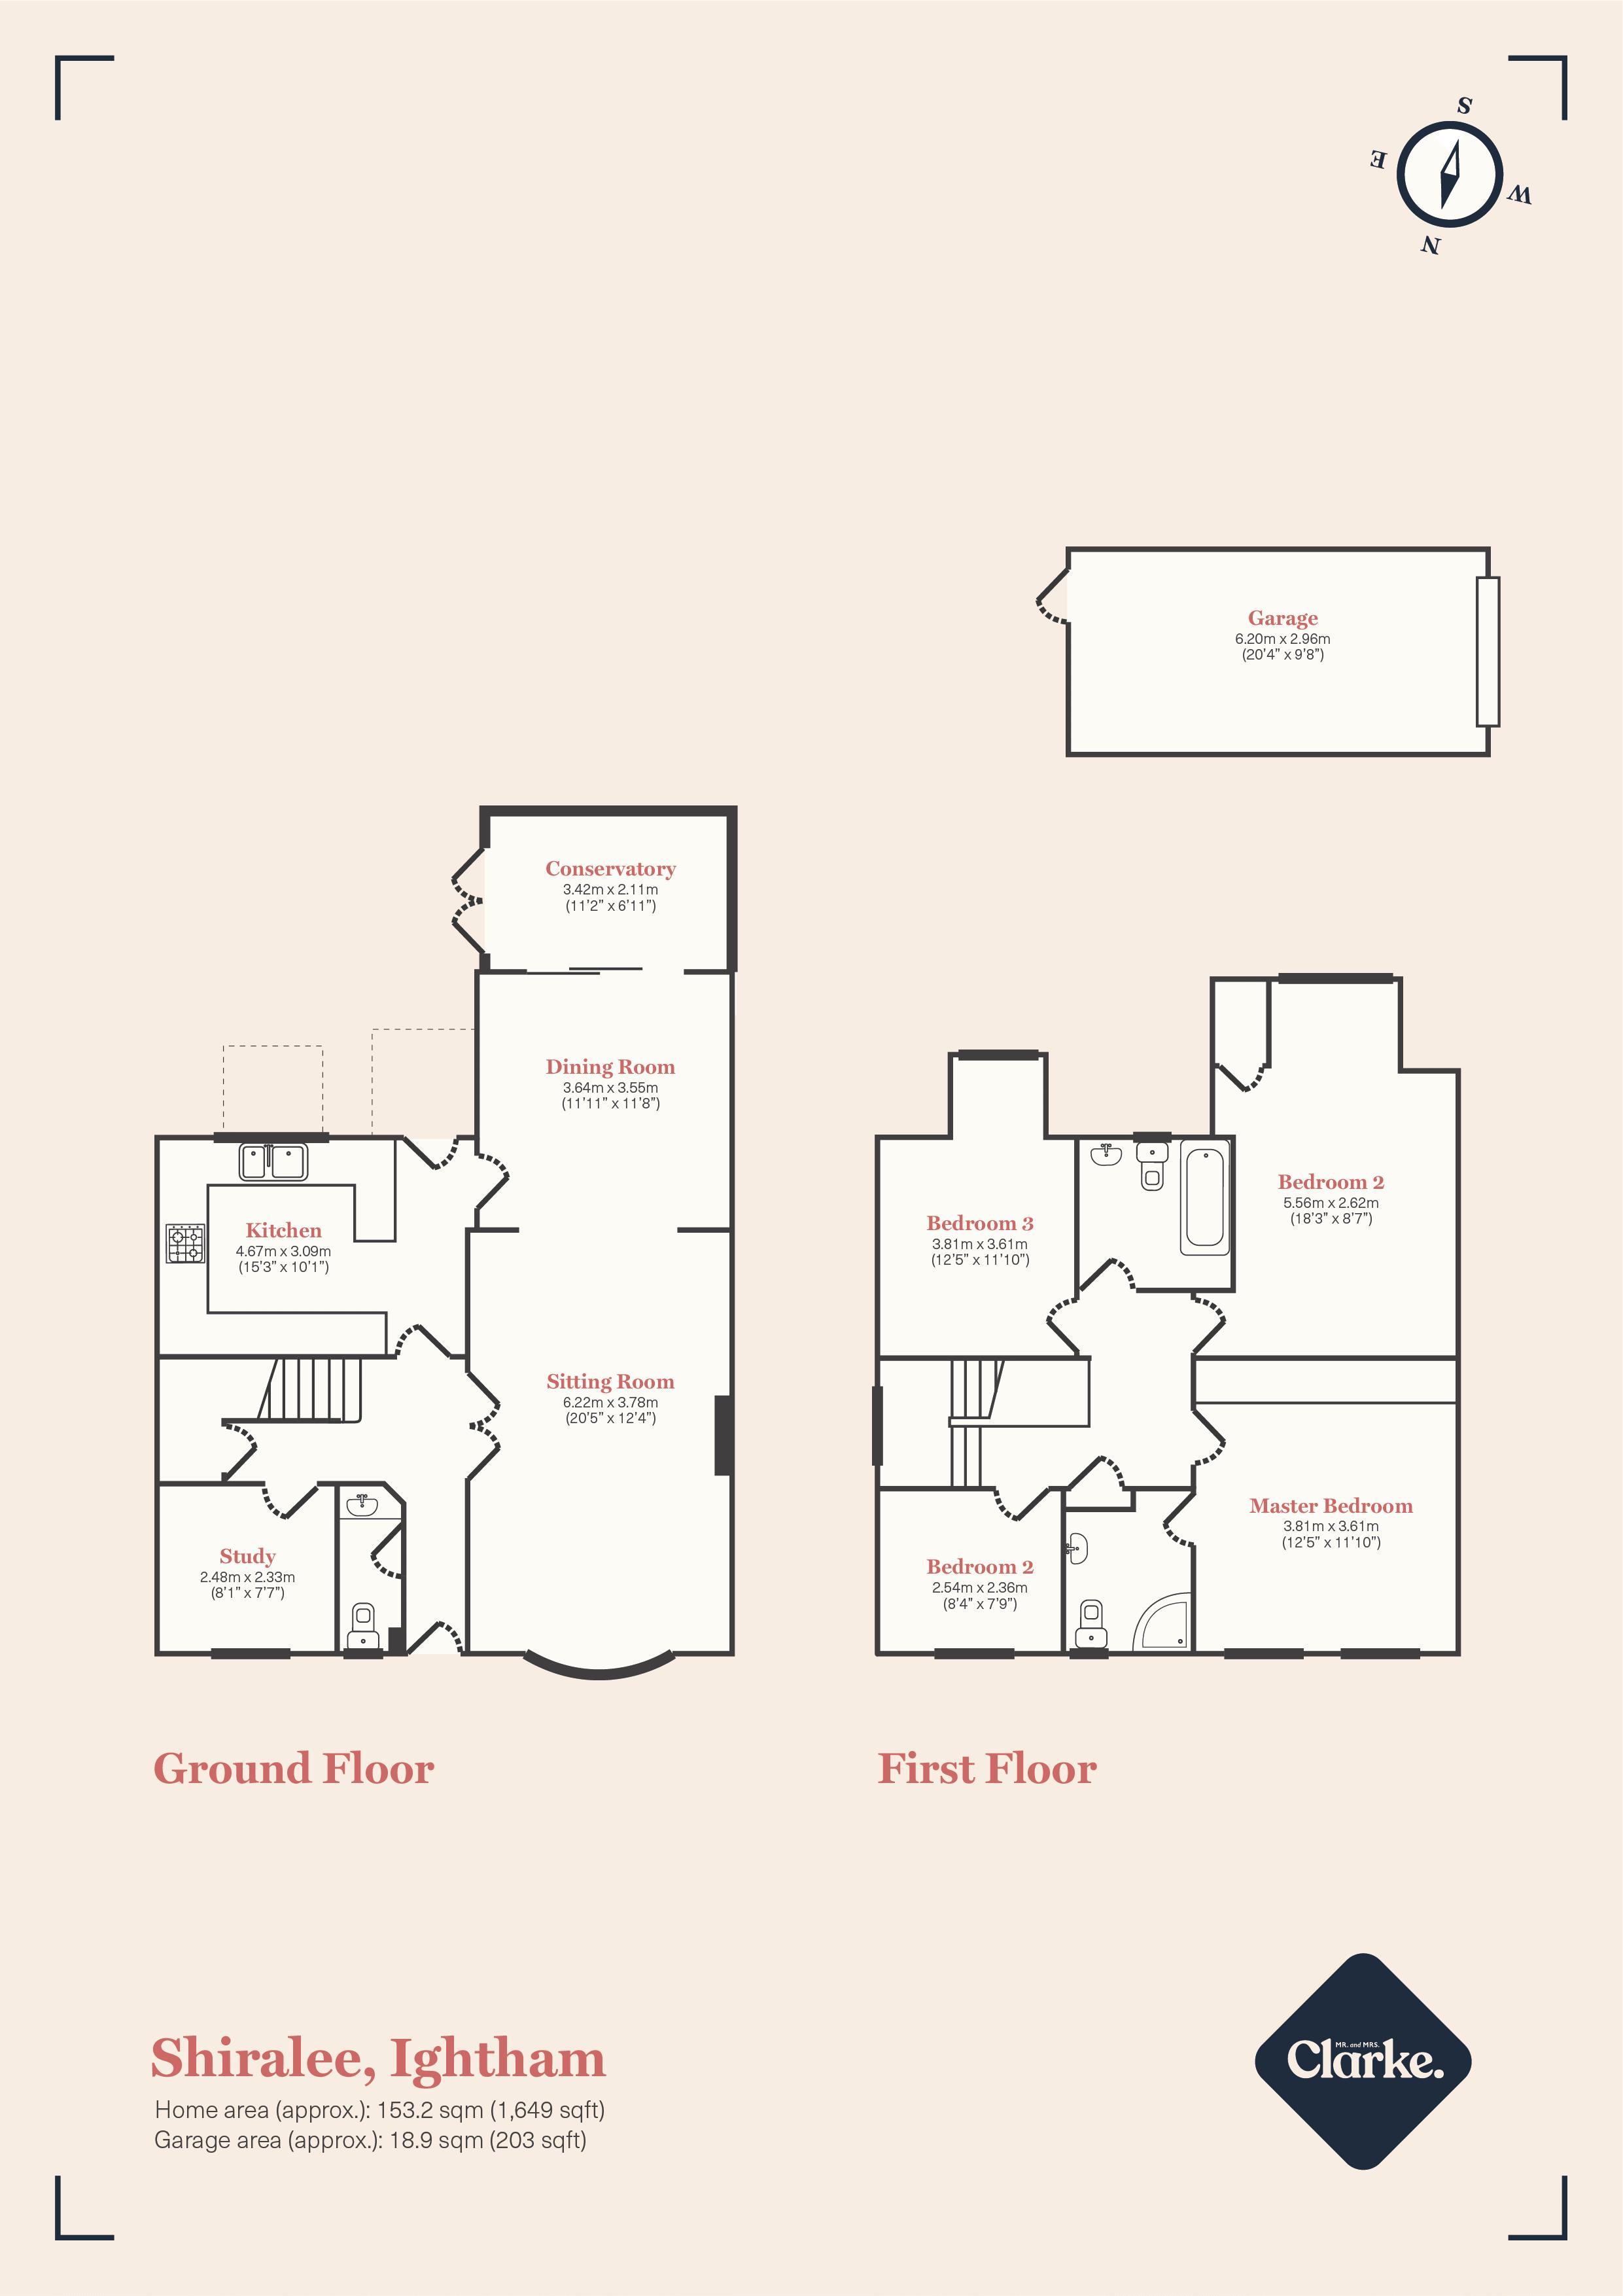 Trycewell Lane, Ightham. Floorplan. Floor Plan.